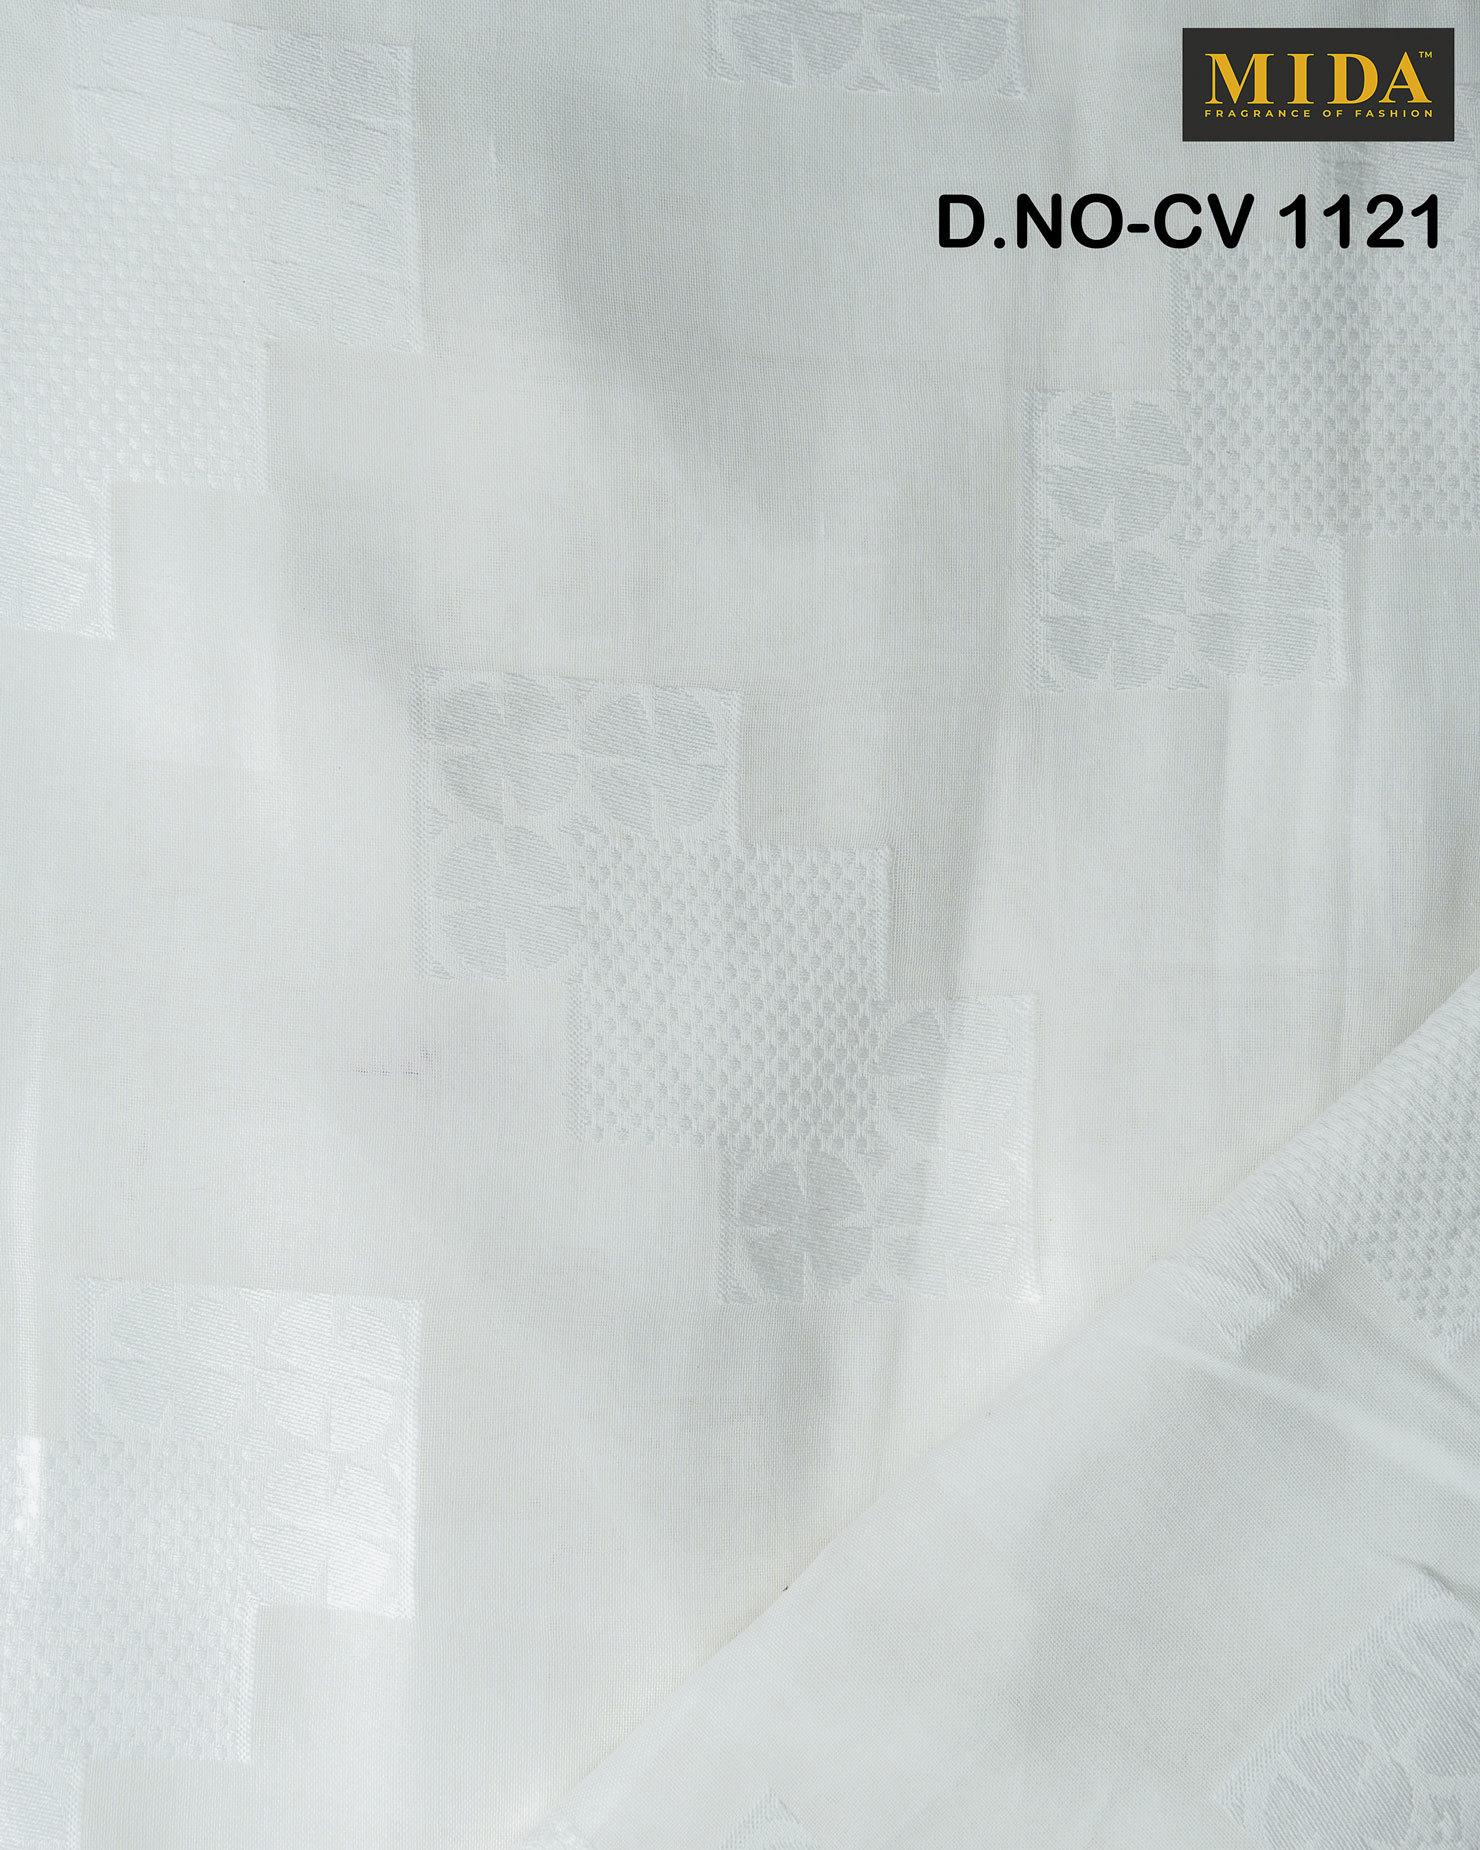 Best Quality Jacquard Cotton Voile Fabric